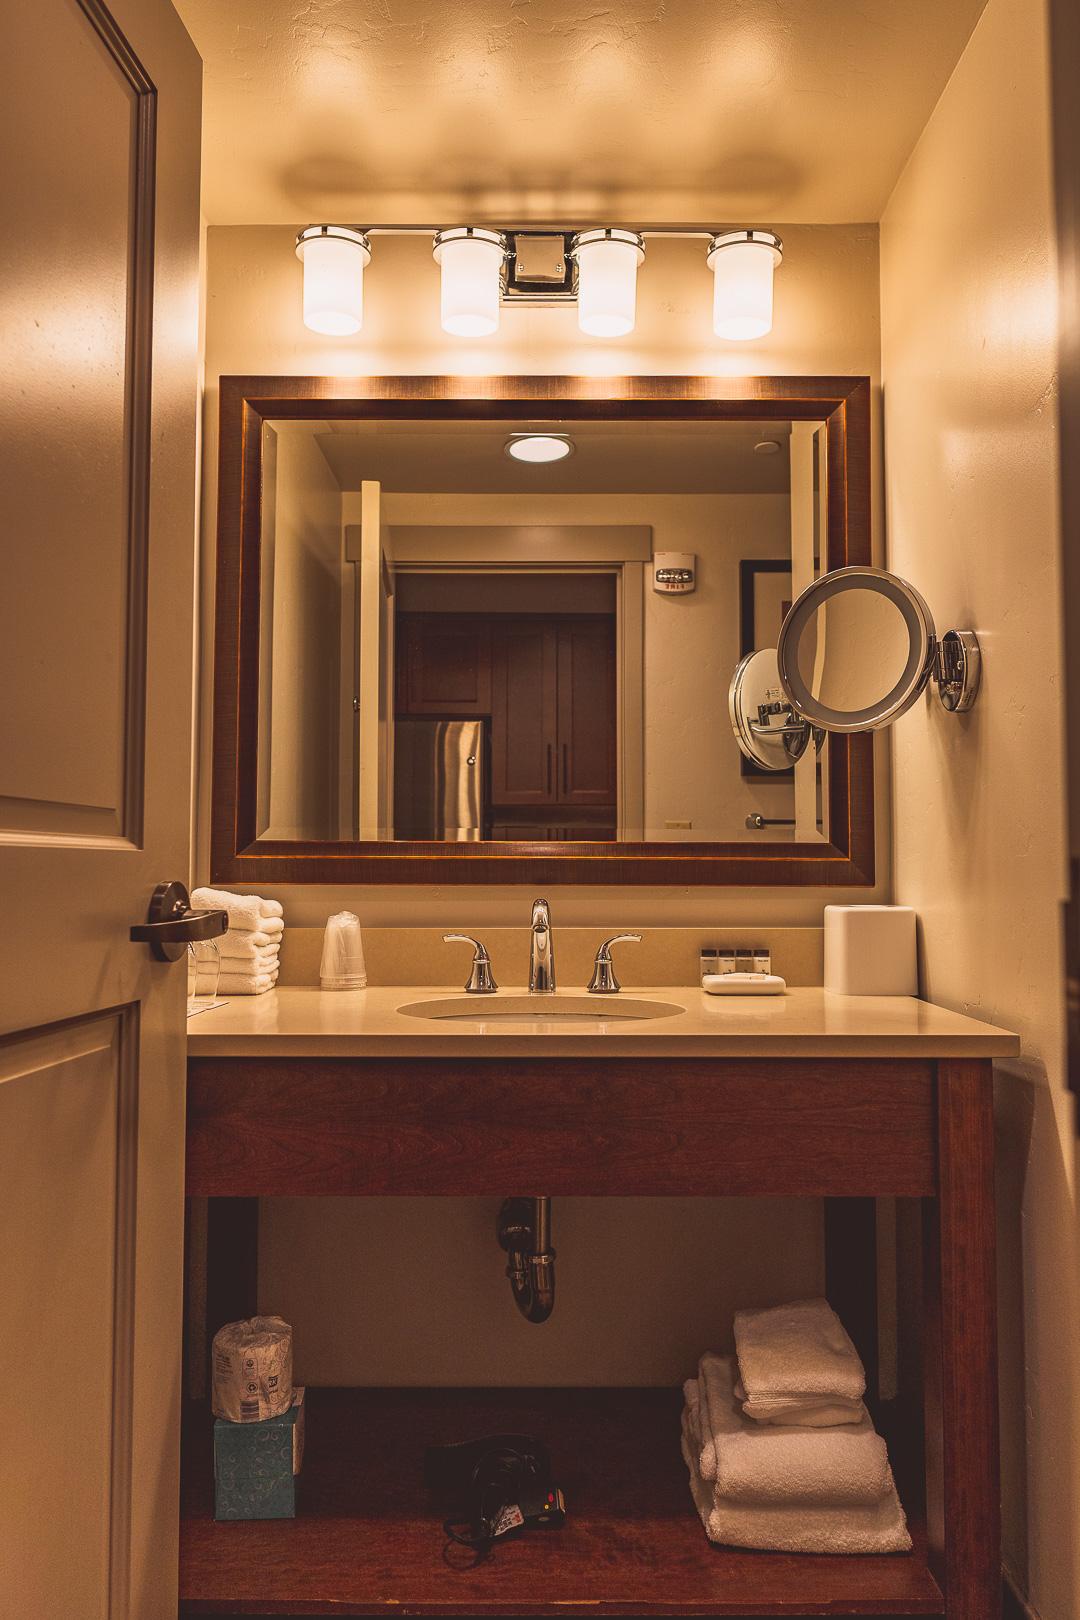 Sheraton Steamboat Resort Villas' Studio Bathroom